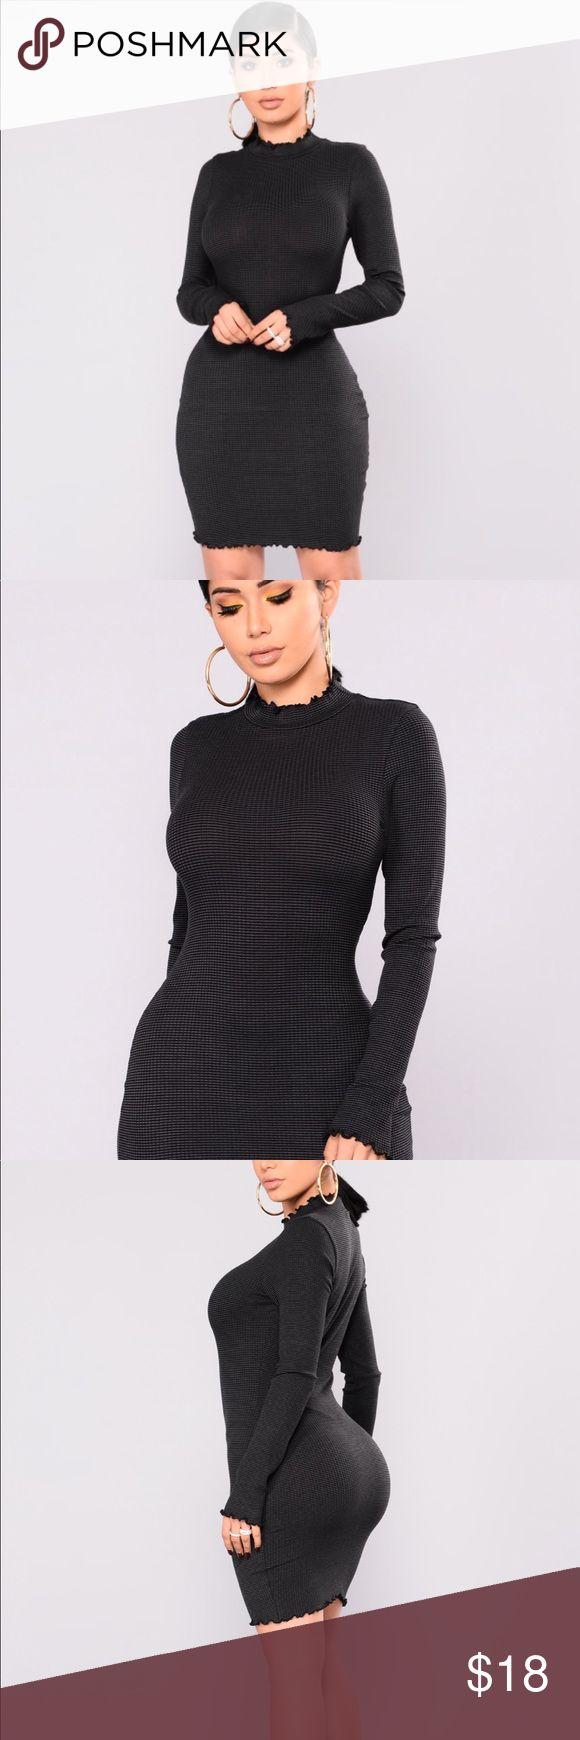 Fashion Nova Striped Bodycon Dress XS Brand new dress from Fashion Nova Striped Bodycon style with cute neckline  XS Fashion Nova Dresses